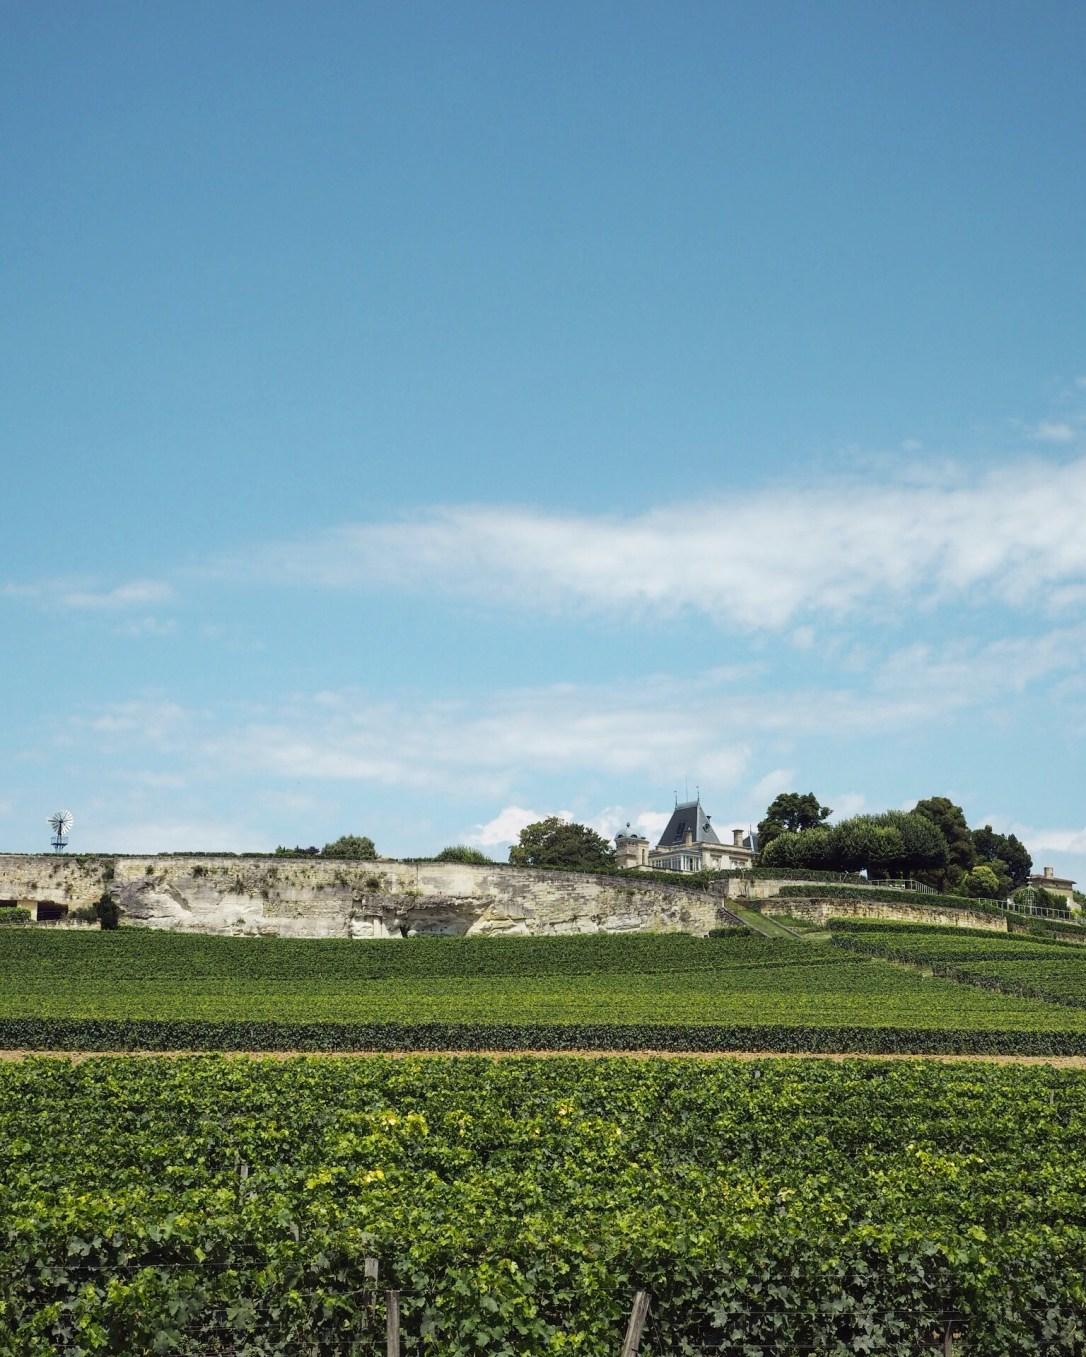 View of a chateaux on the horizon in Saint-Émilion